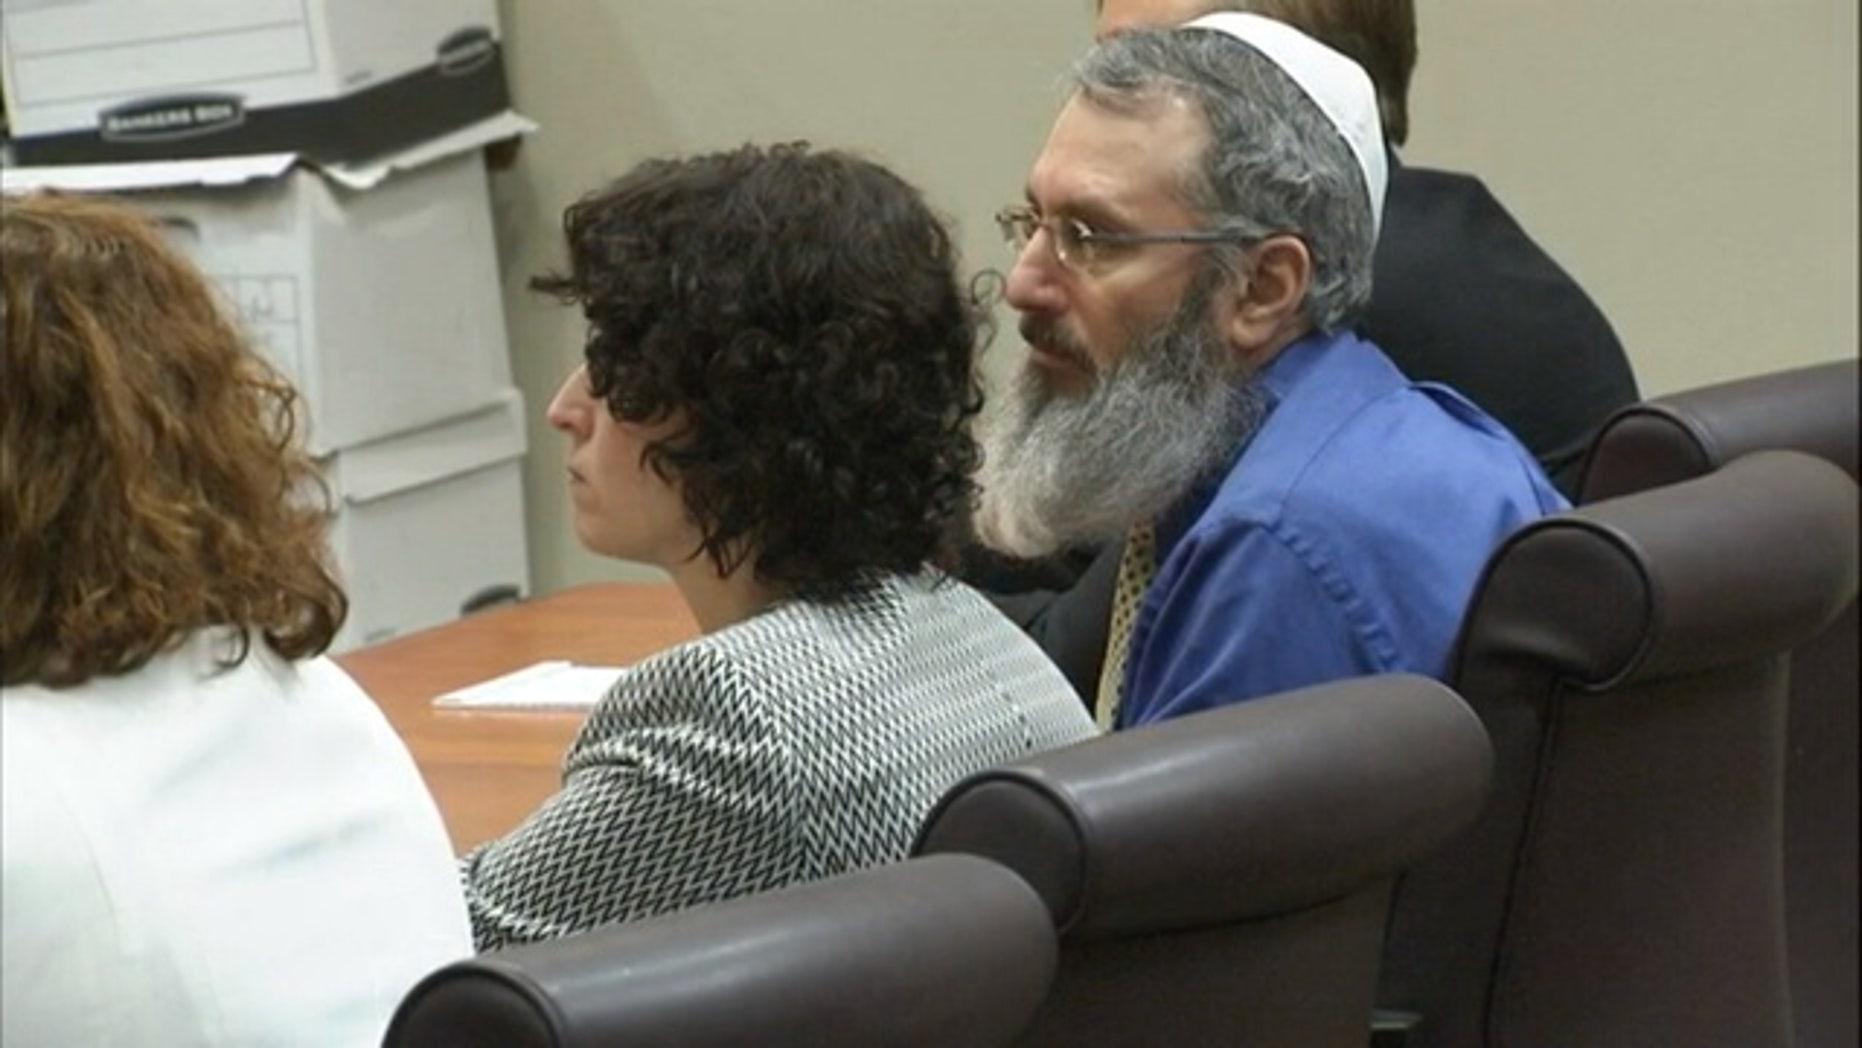 Hemy Neuman, right, in court.